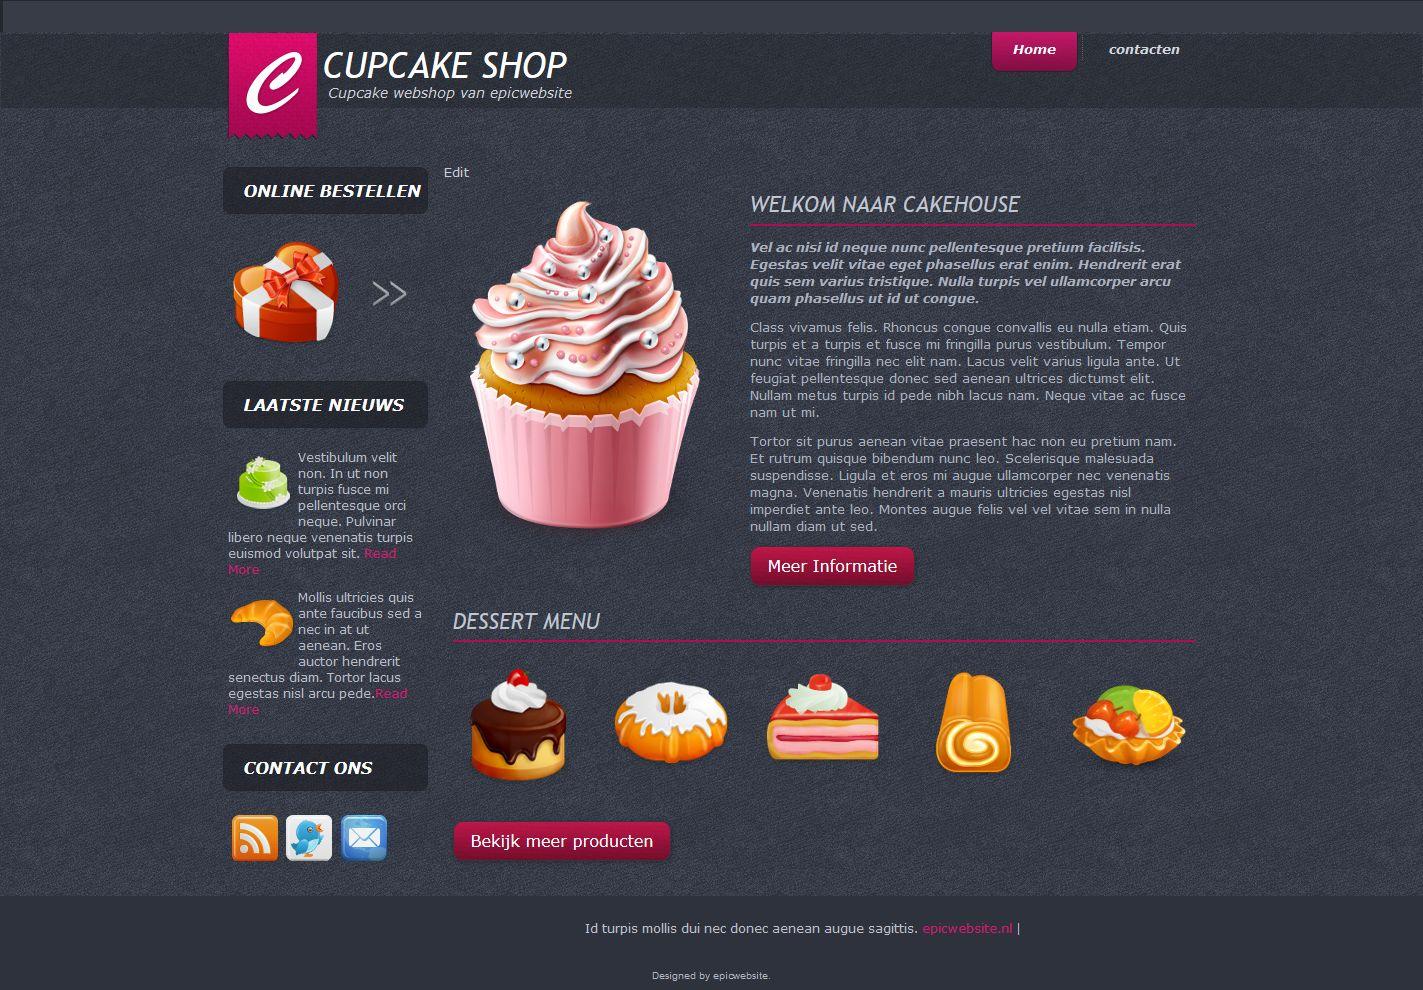 cupcake webshop beginnen foto